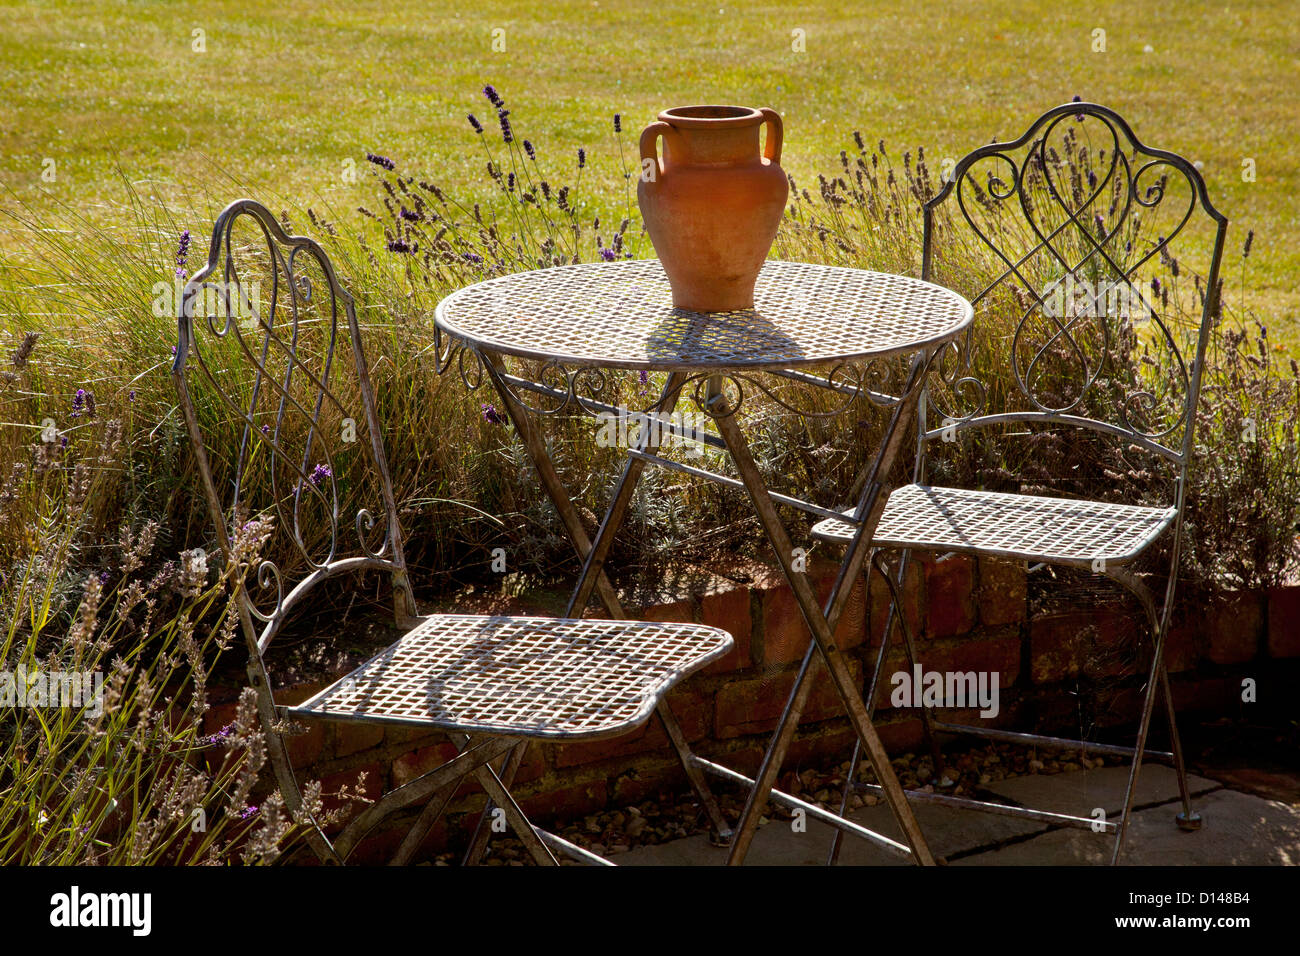 Sedie Francesi Da Giardino : Metallo stile francese di mobili da giardino tavolo e sedie con